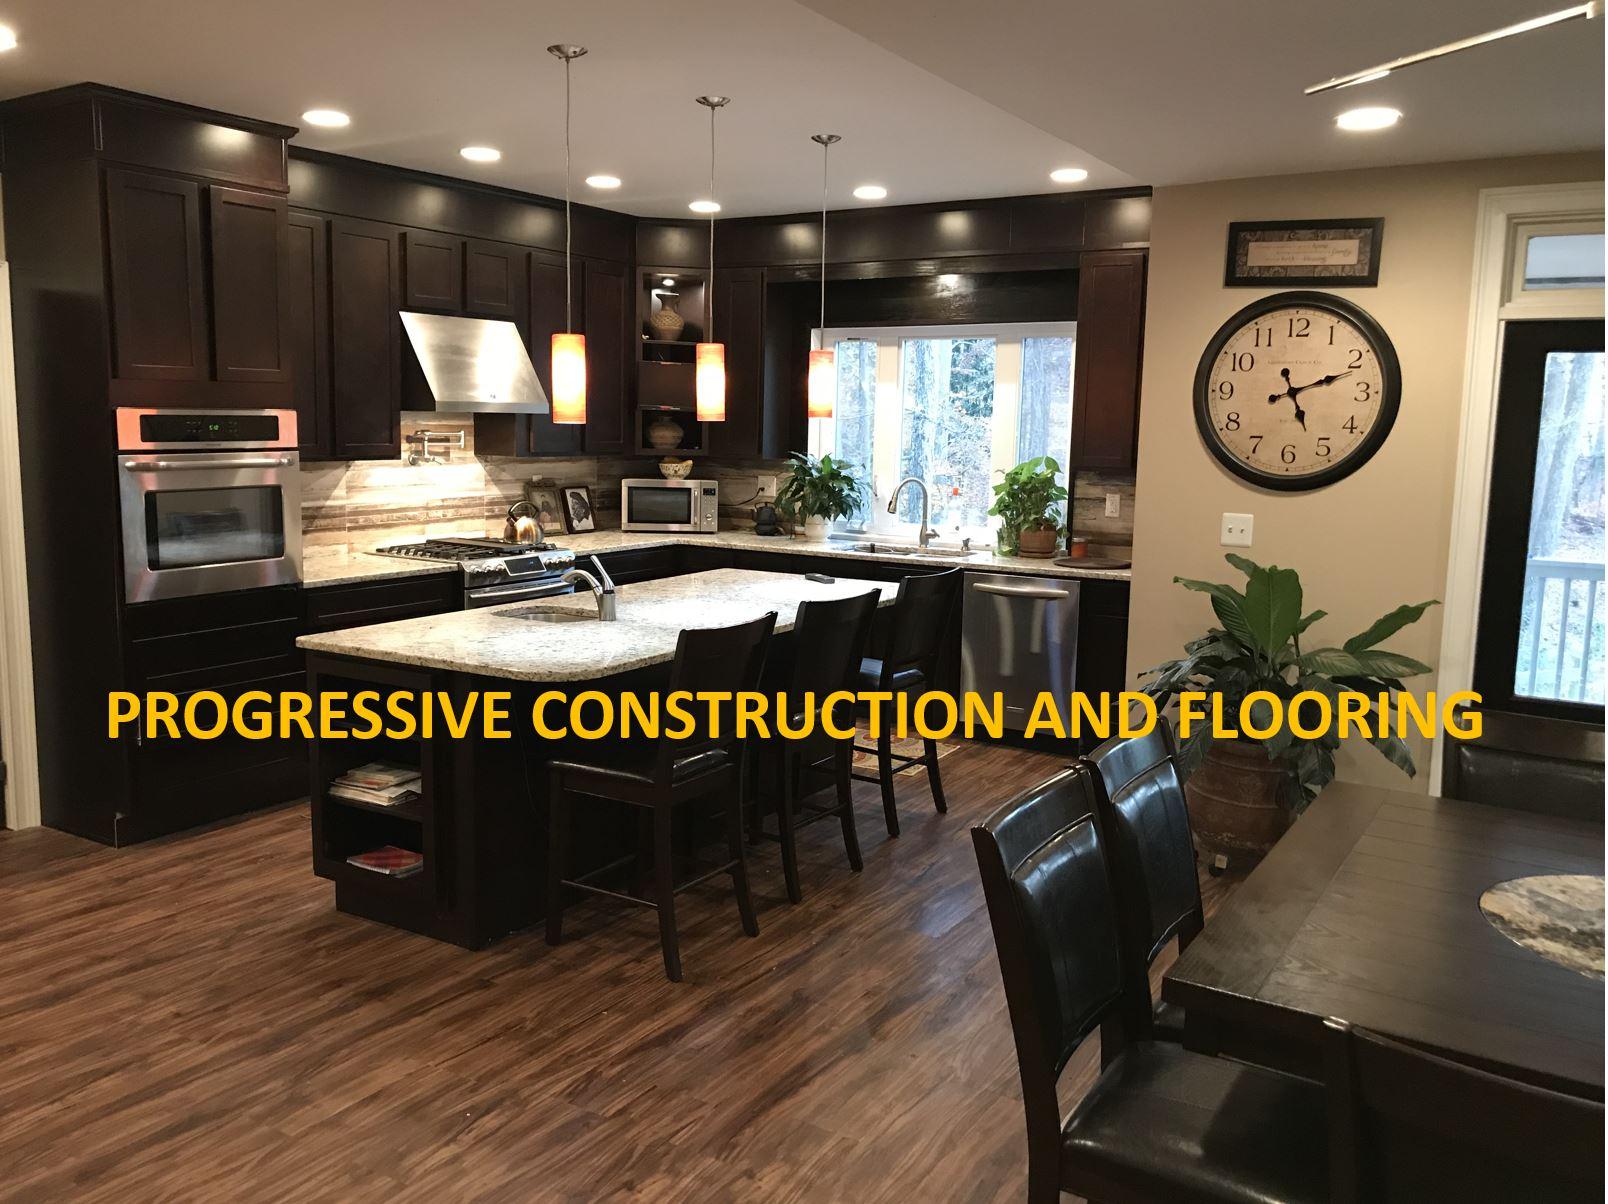 Atlanta Basement Finishing Kitchen Remodeling and Architectural